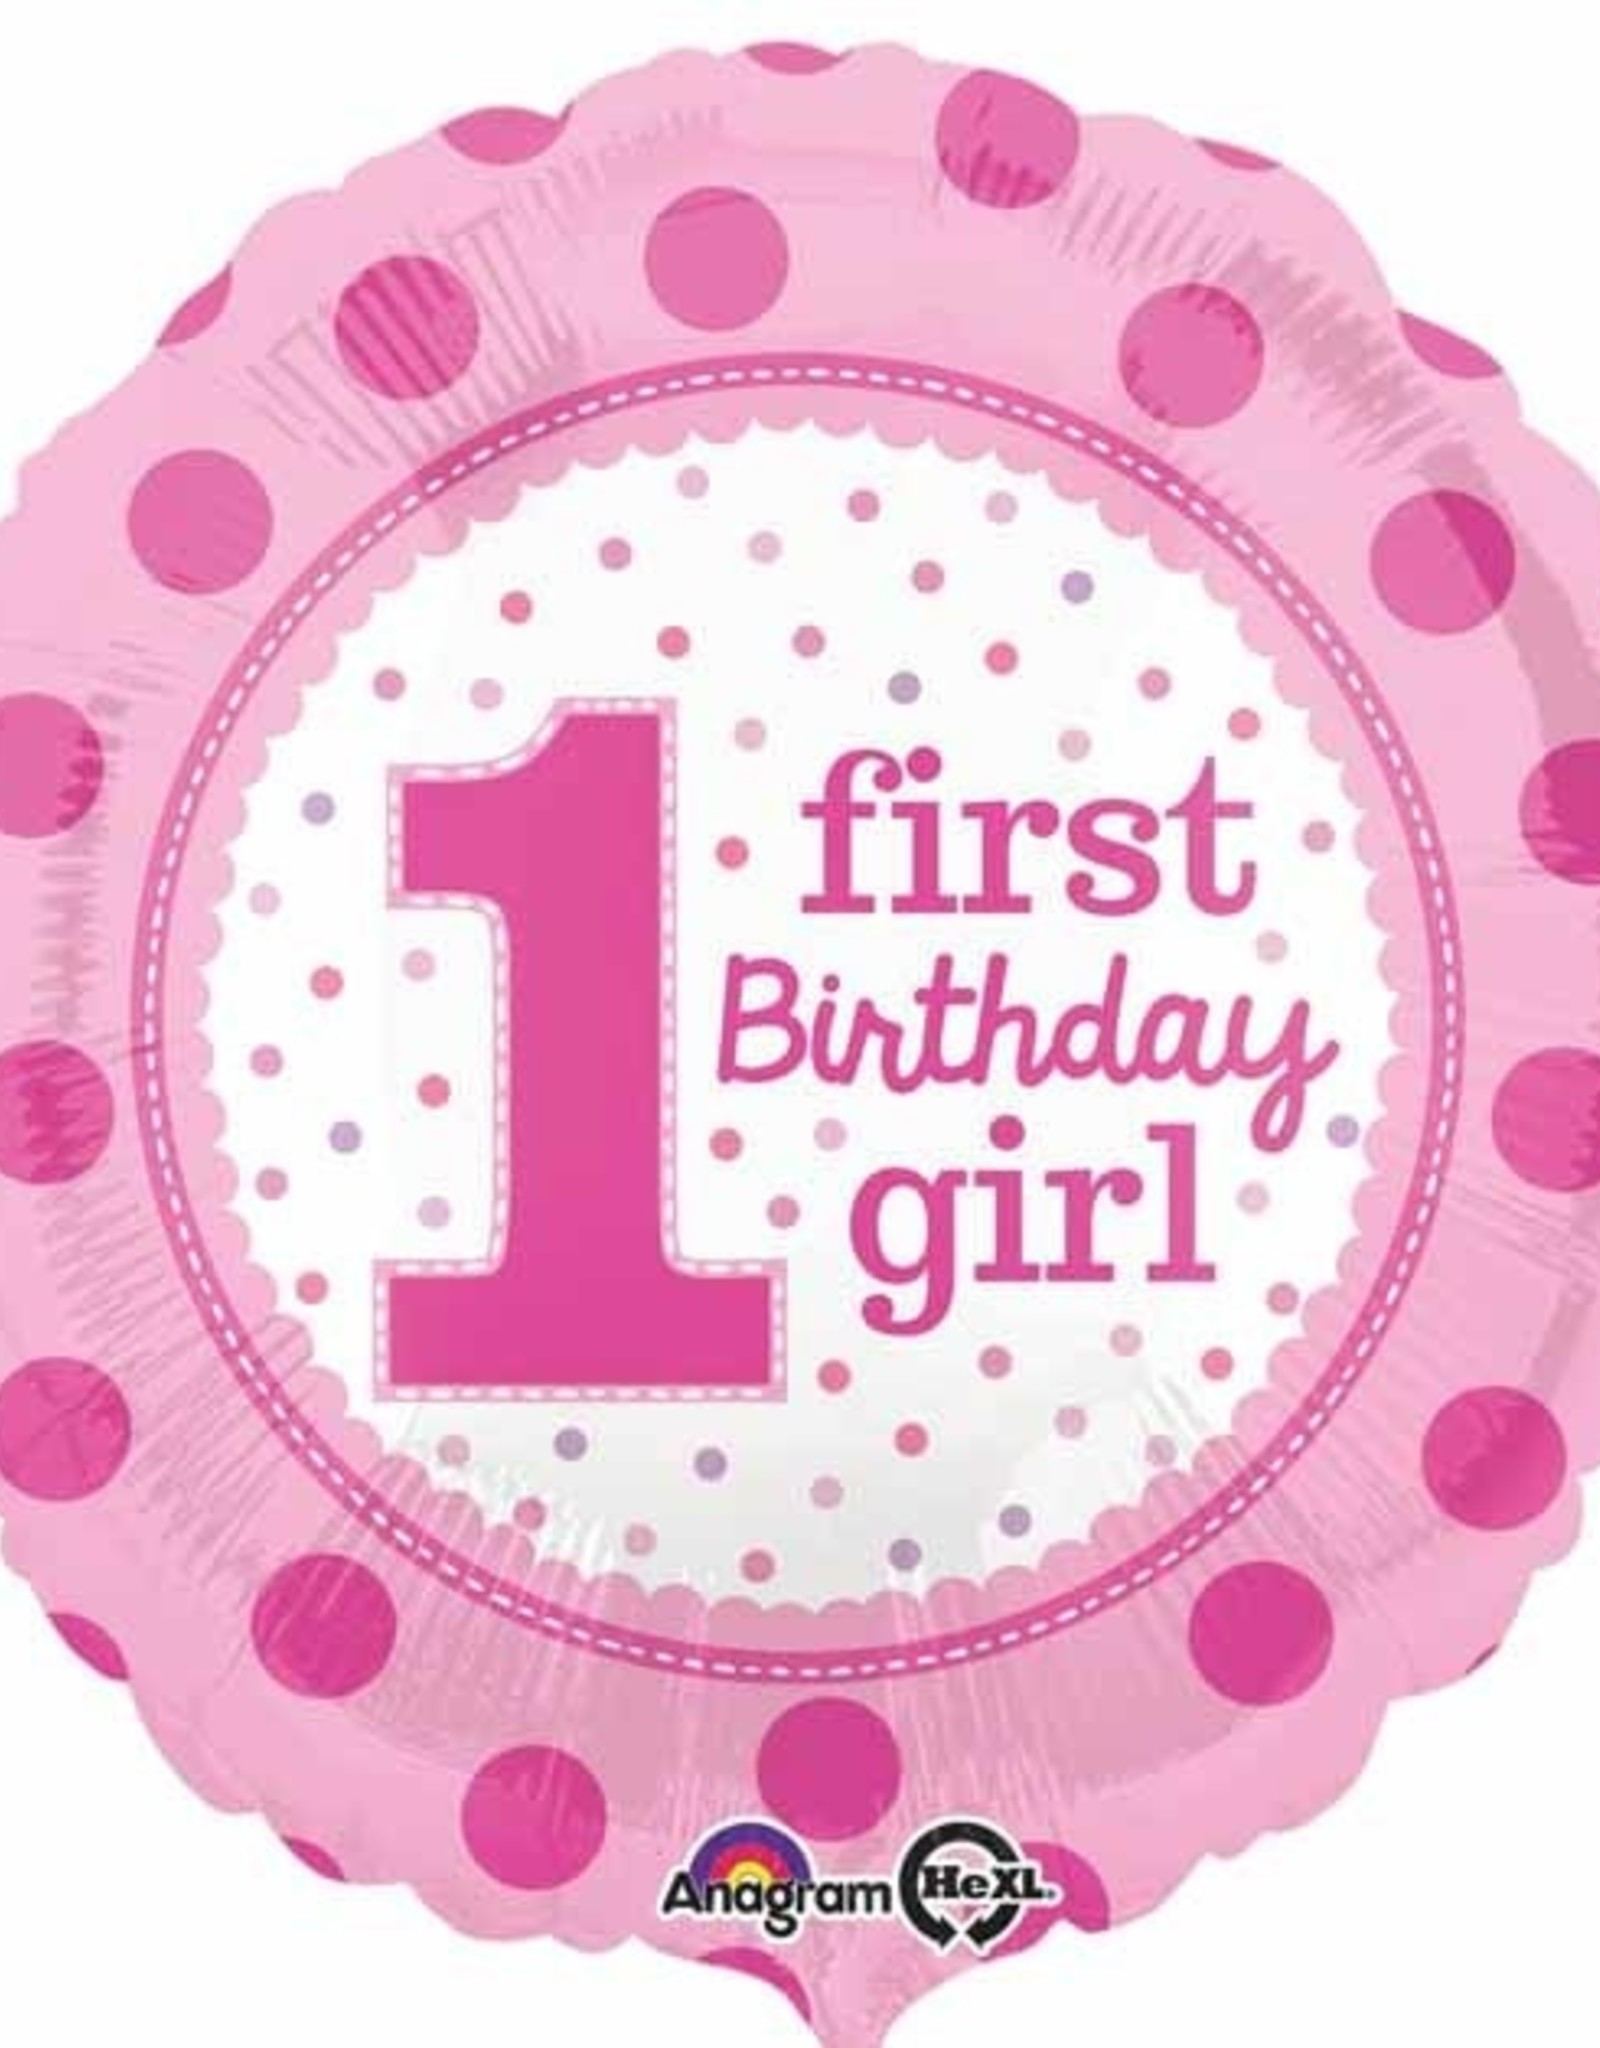 "'First Birthday Girl' Foil Ballon-Pink Polka Dot 18"""